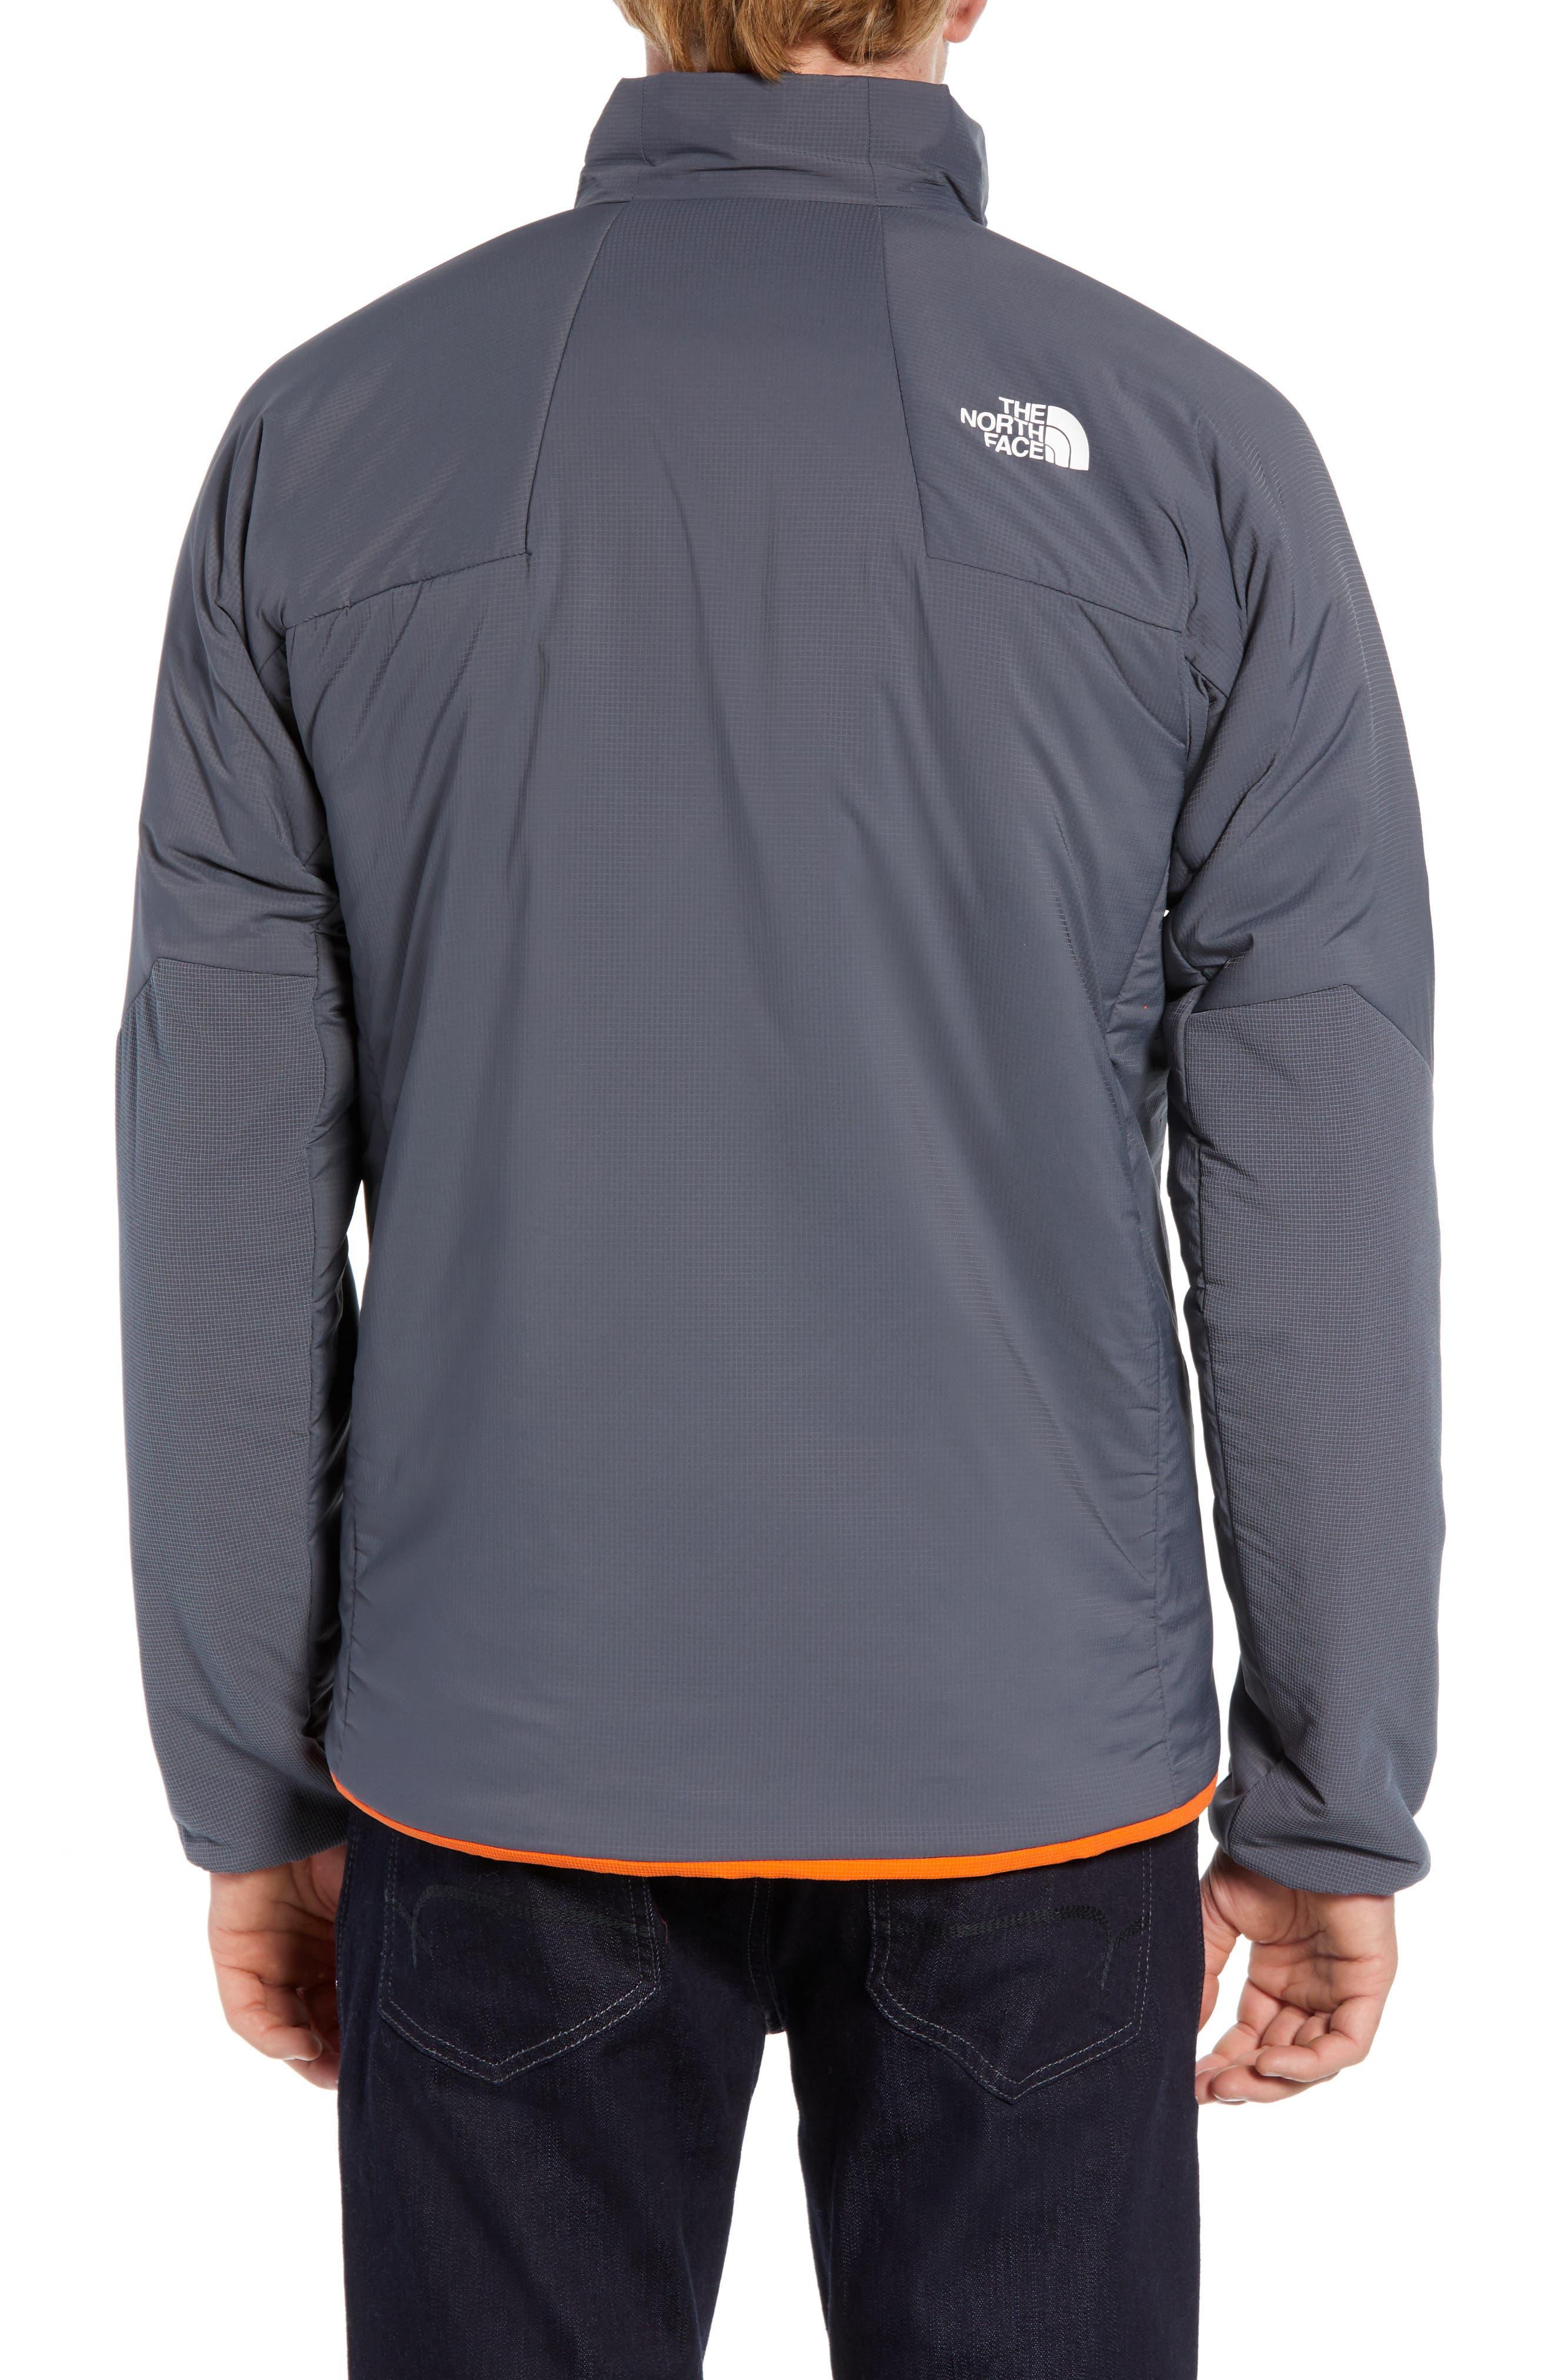 Ventrix Water Resistant Ripstop Jacket,                             Alternate thumbnail 2, color,                             VANADIS GREY/ VANADIS GREY